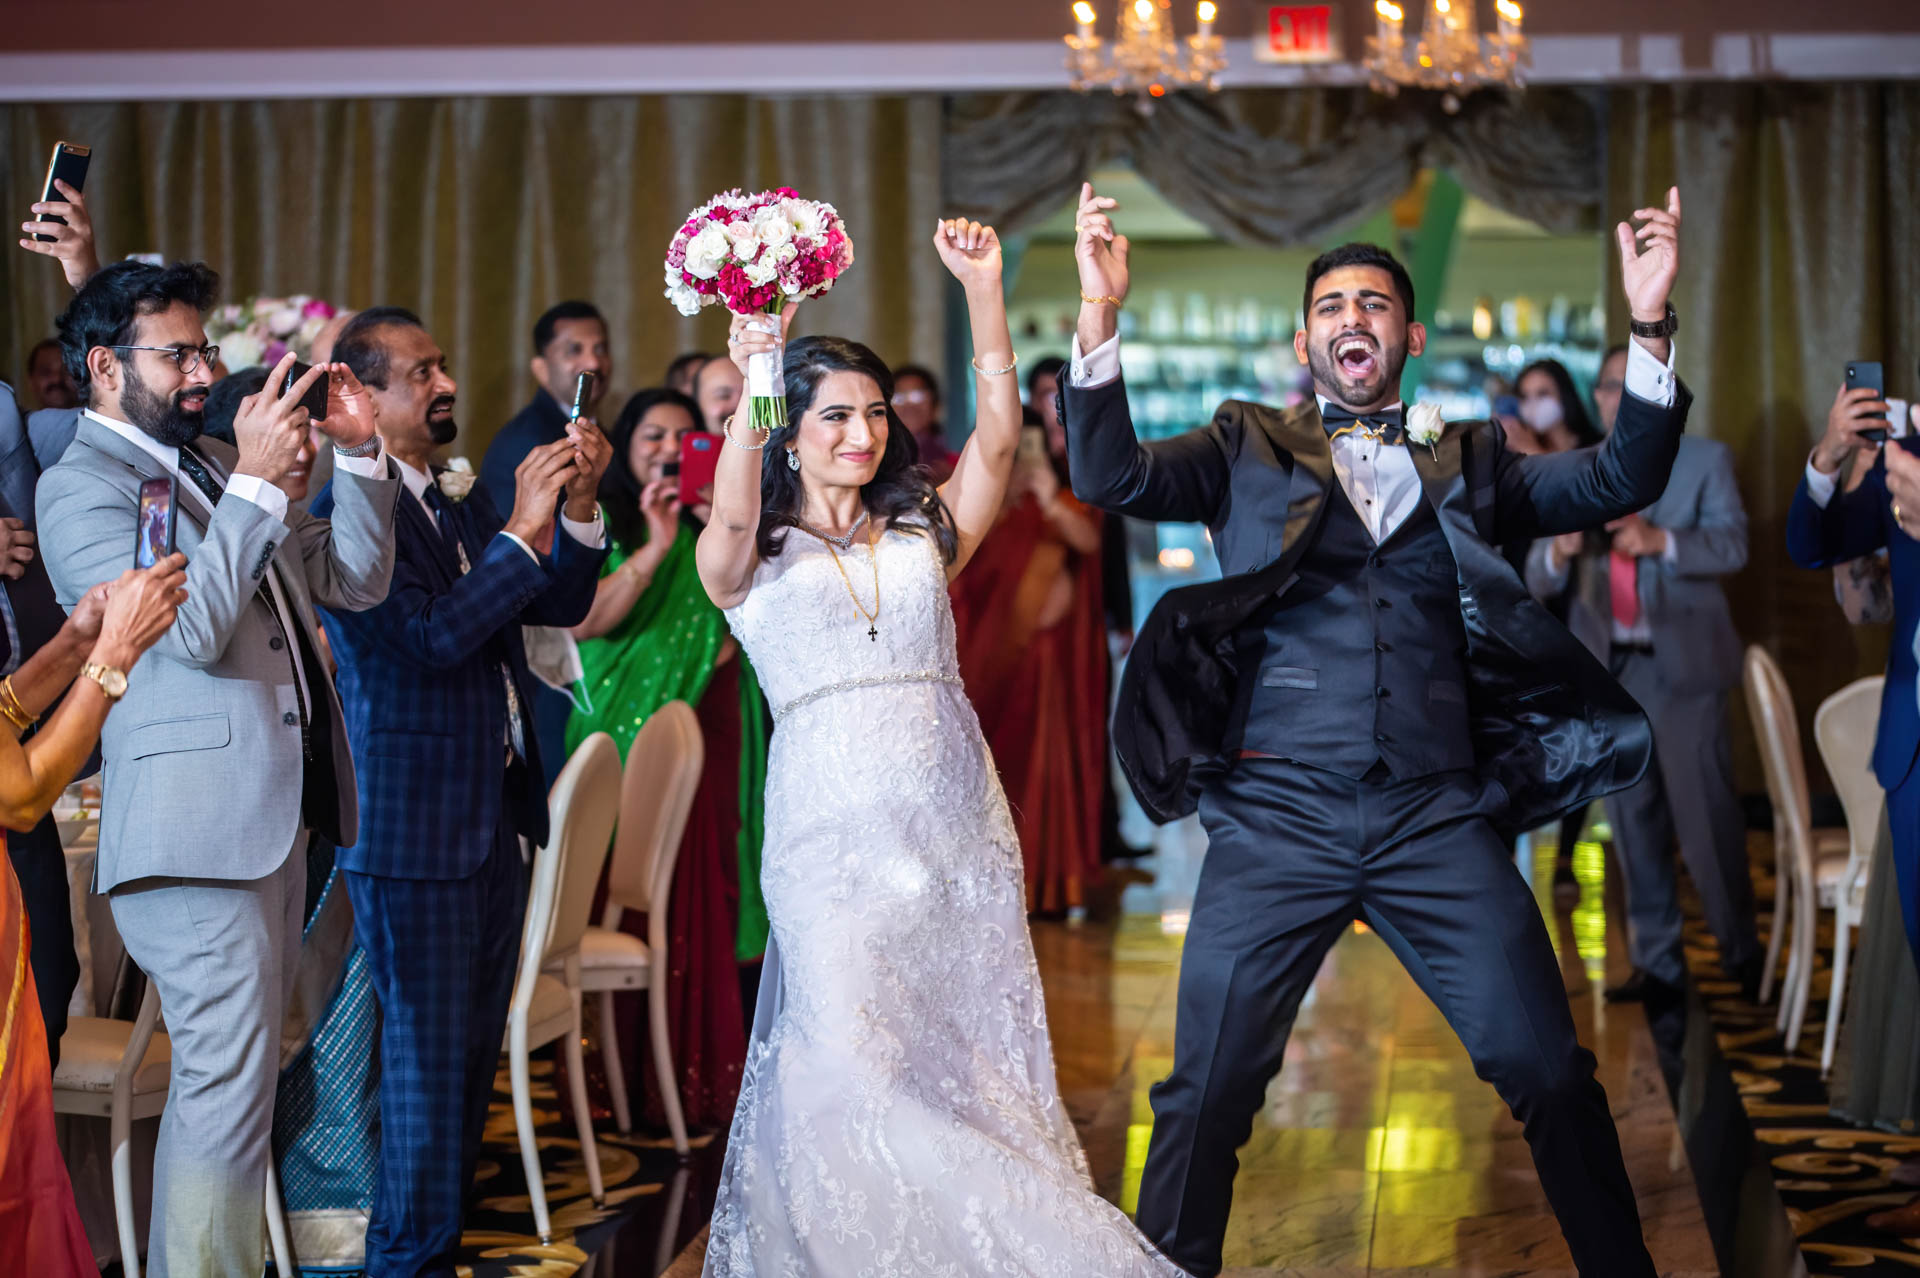 WESTMOUNT COUNTRY CLUB INDIAN WEDDING 26